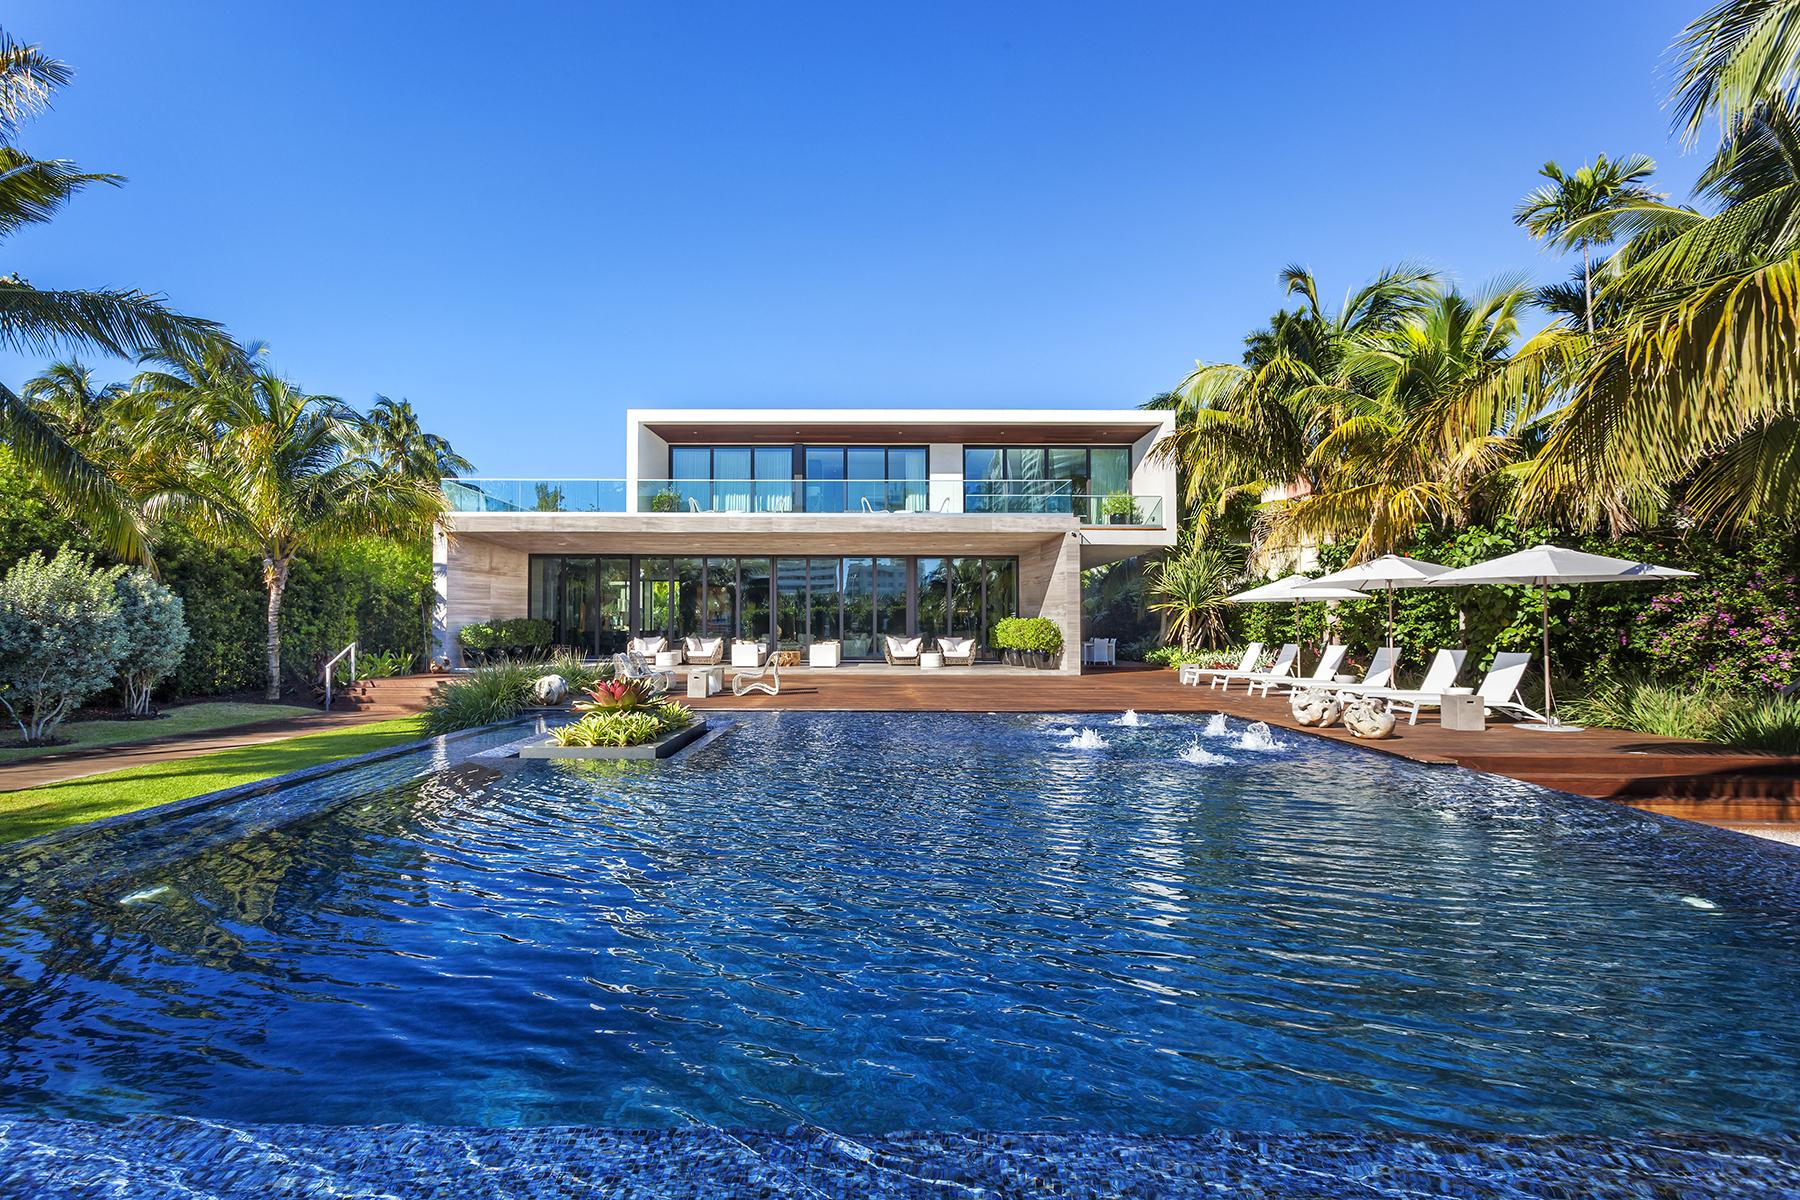 Beautiful Miami Beach contemporary asks 23M  Curbed Miami